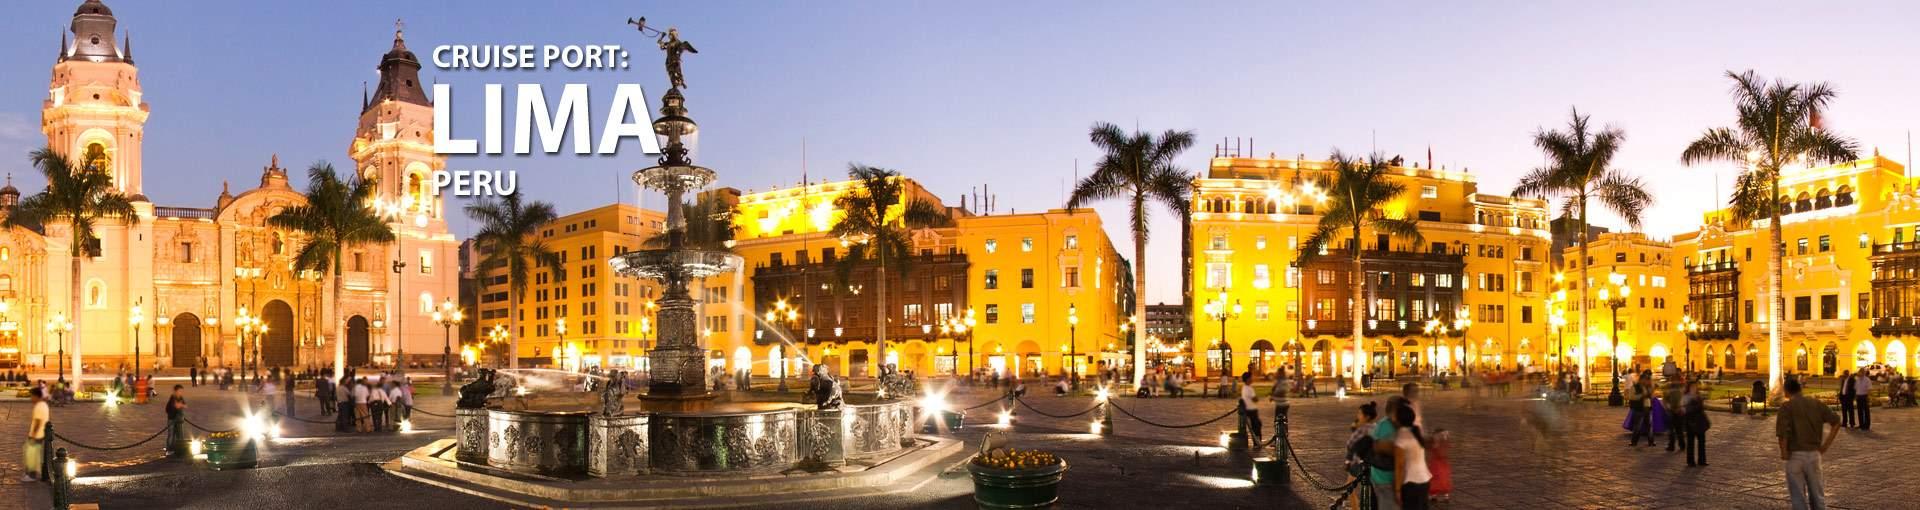 Cruises from Callao, Peru